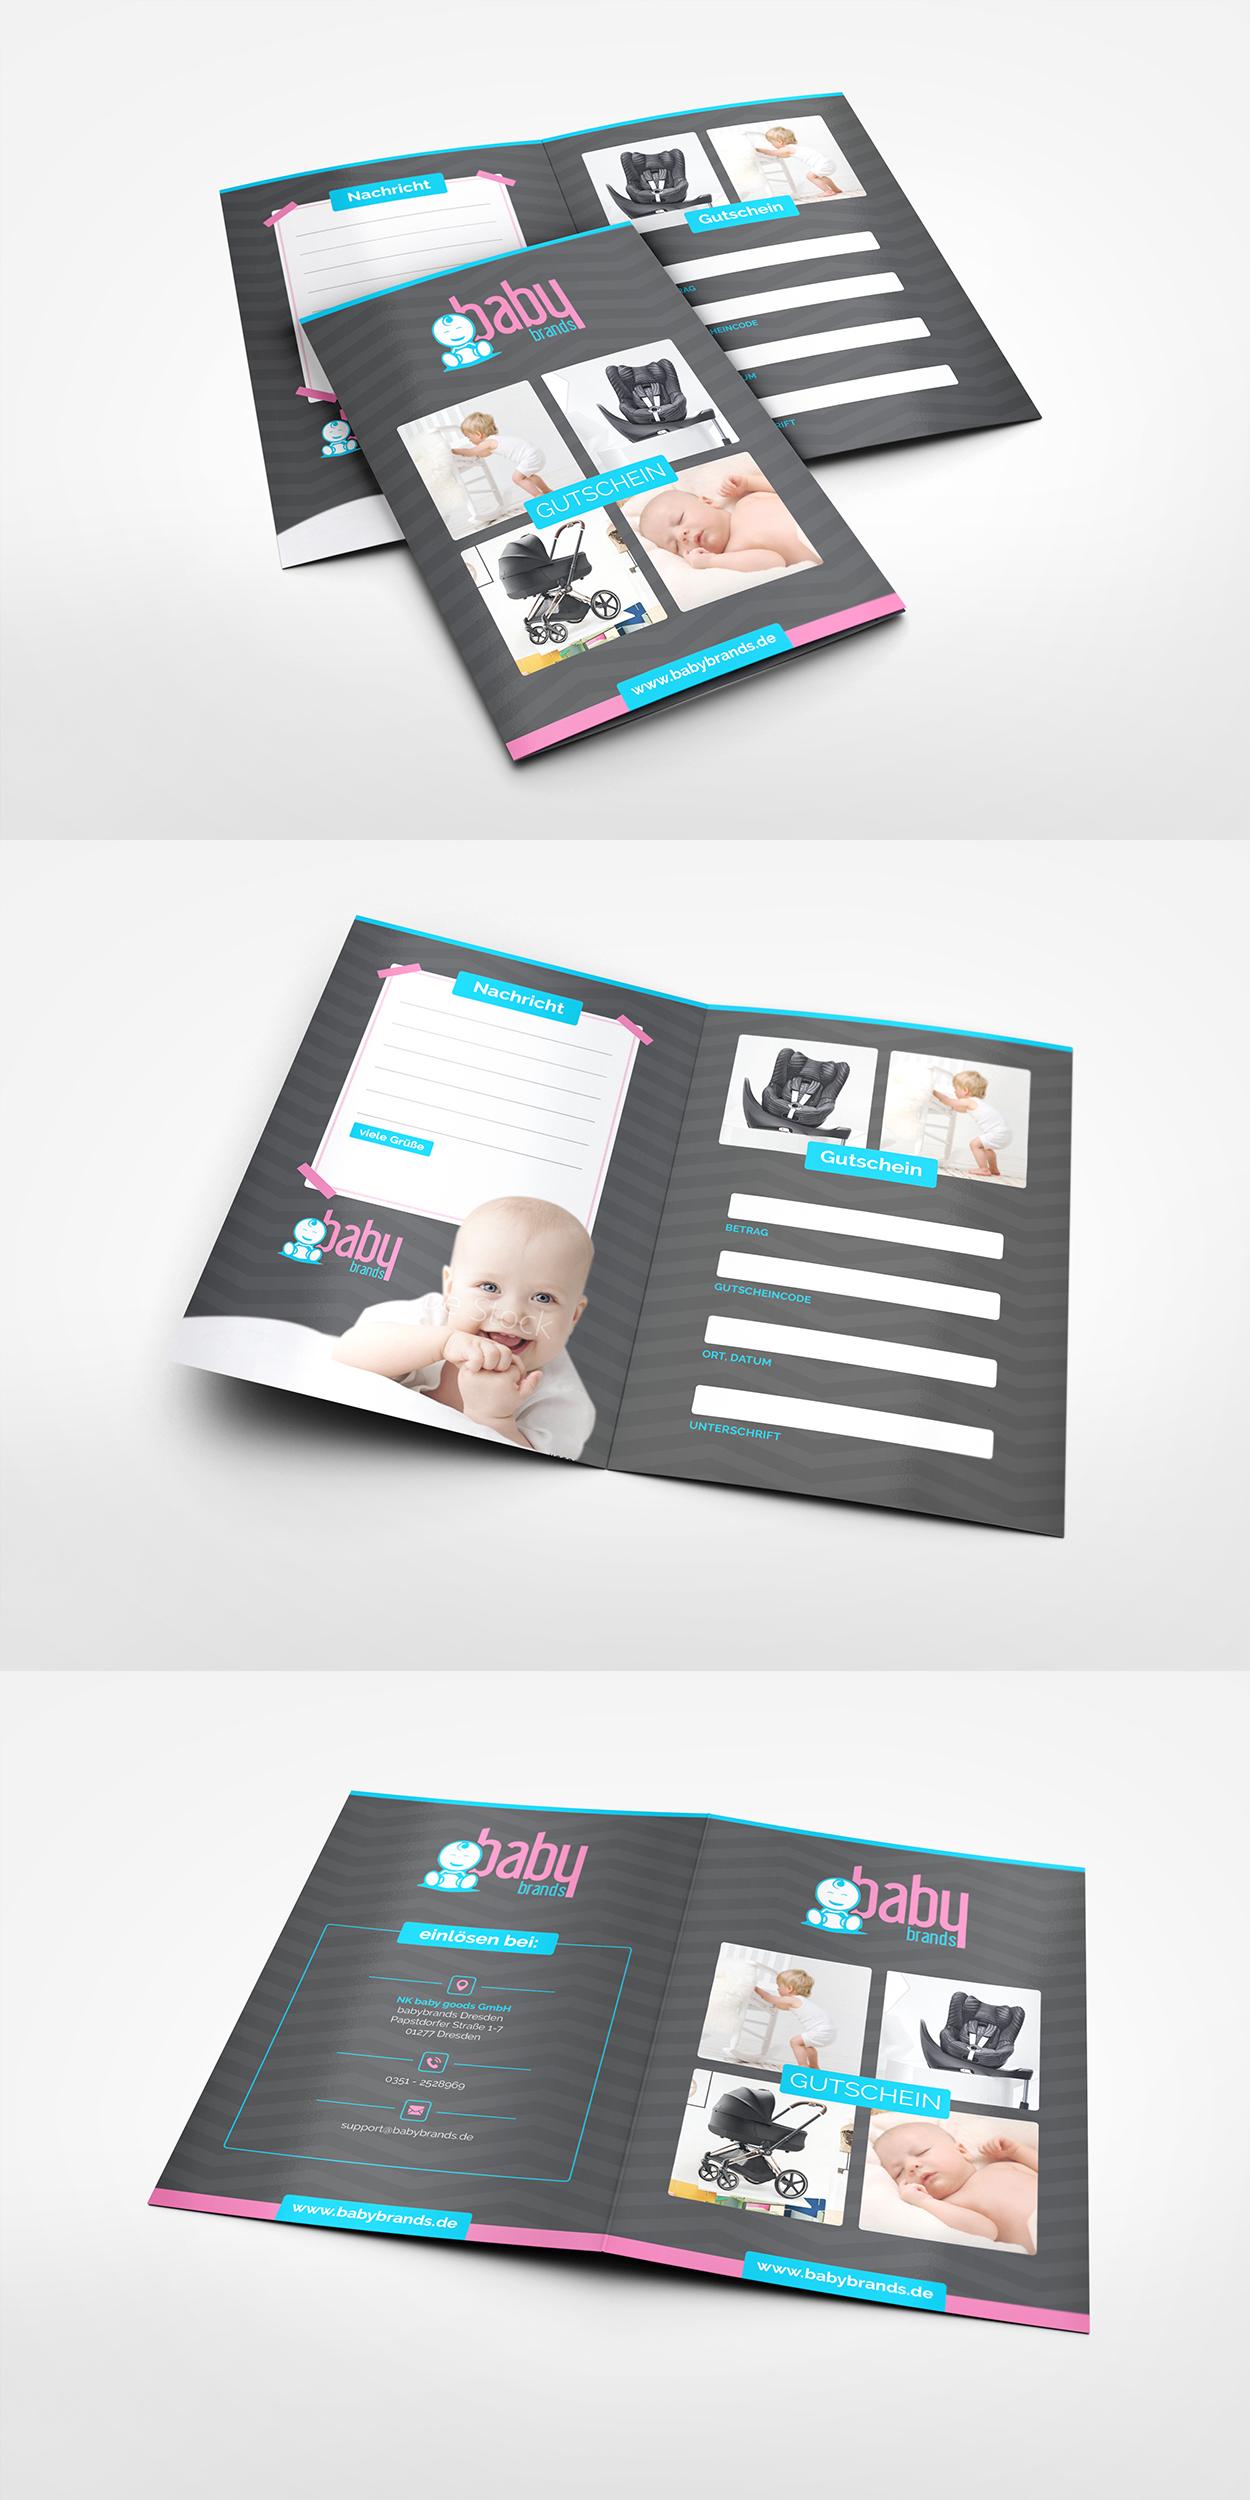 design #9 of MaDesigns